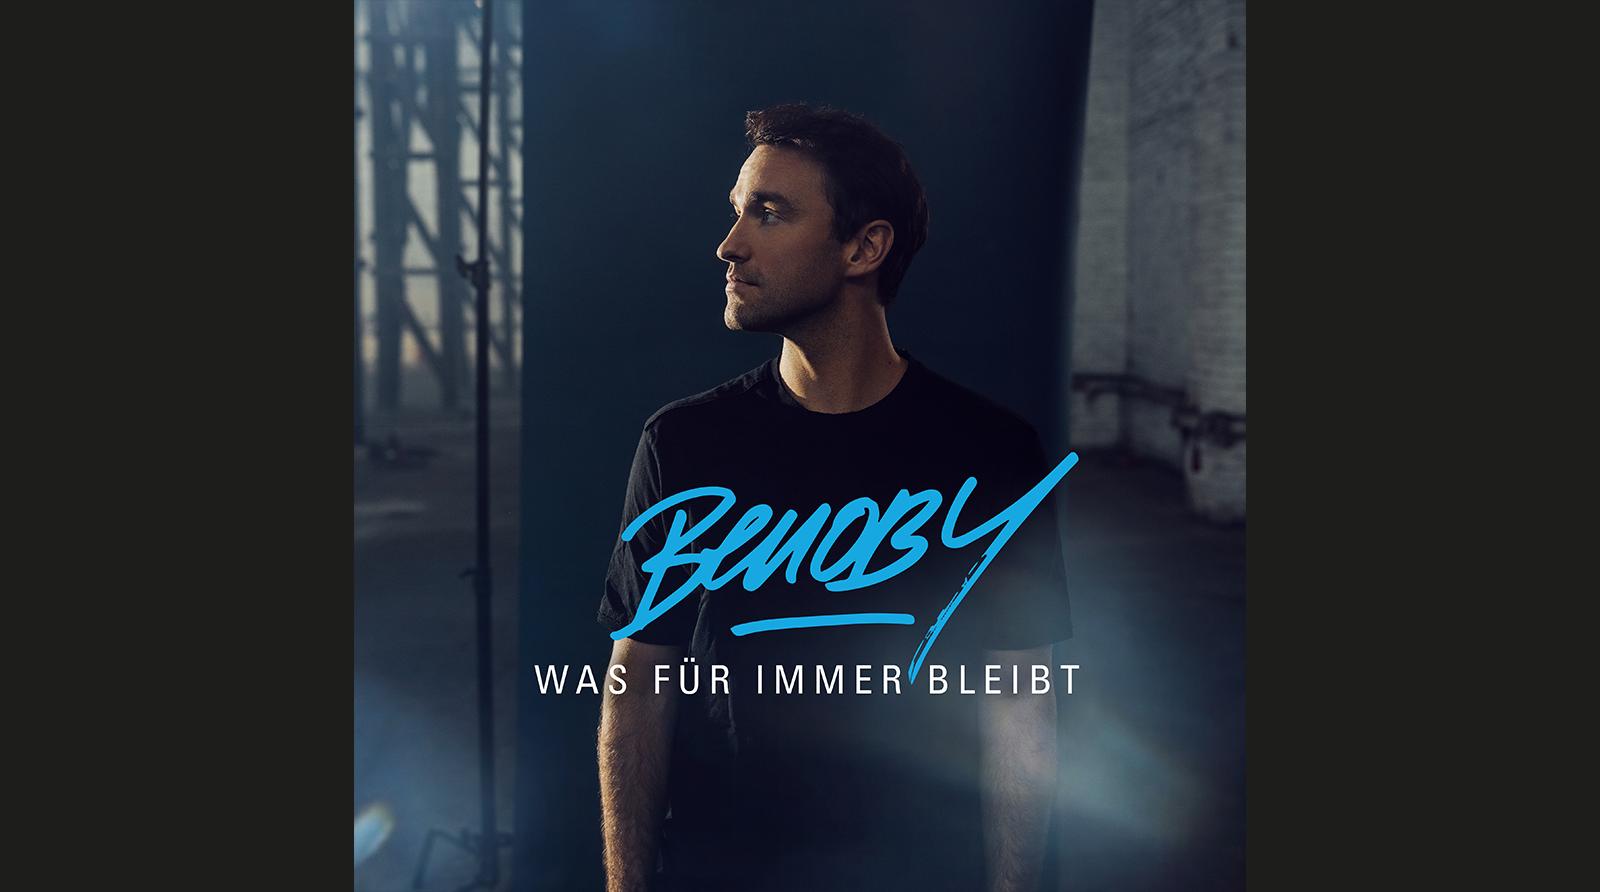 benoby_10